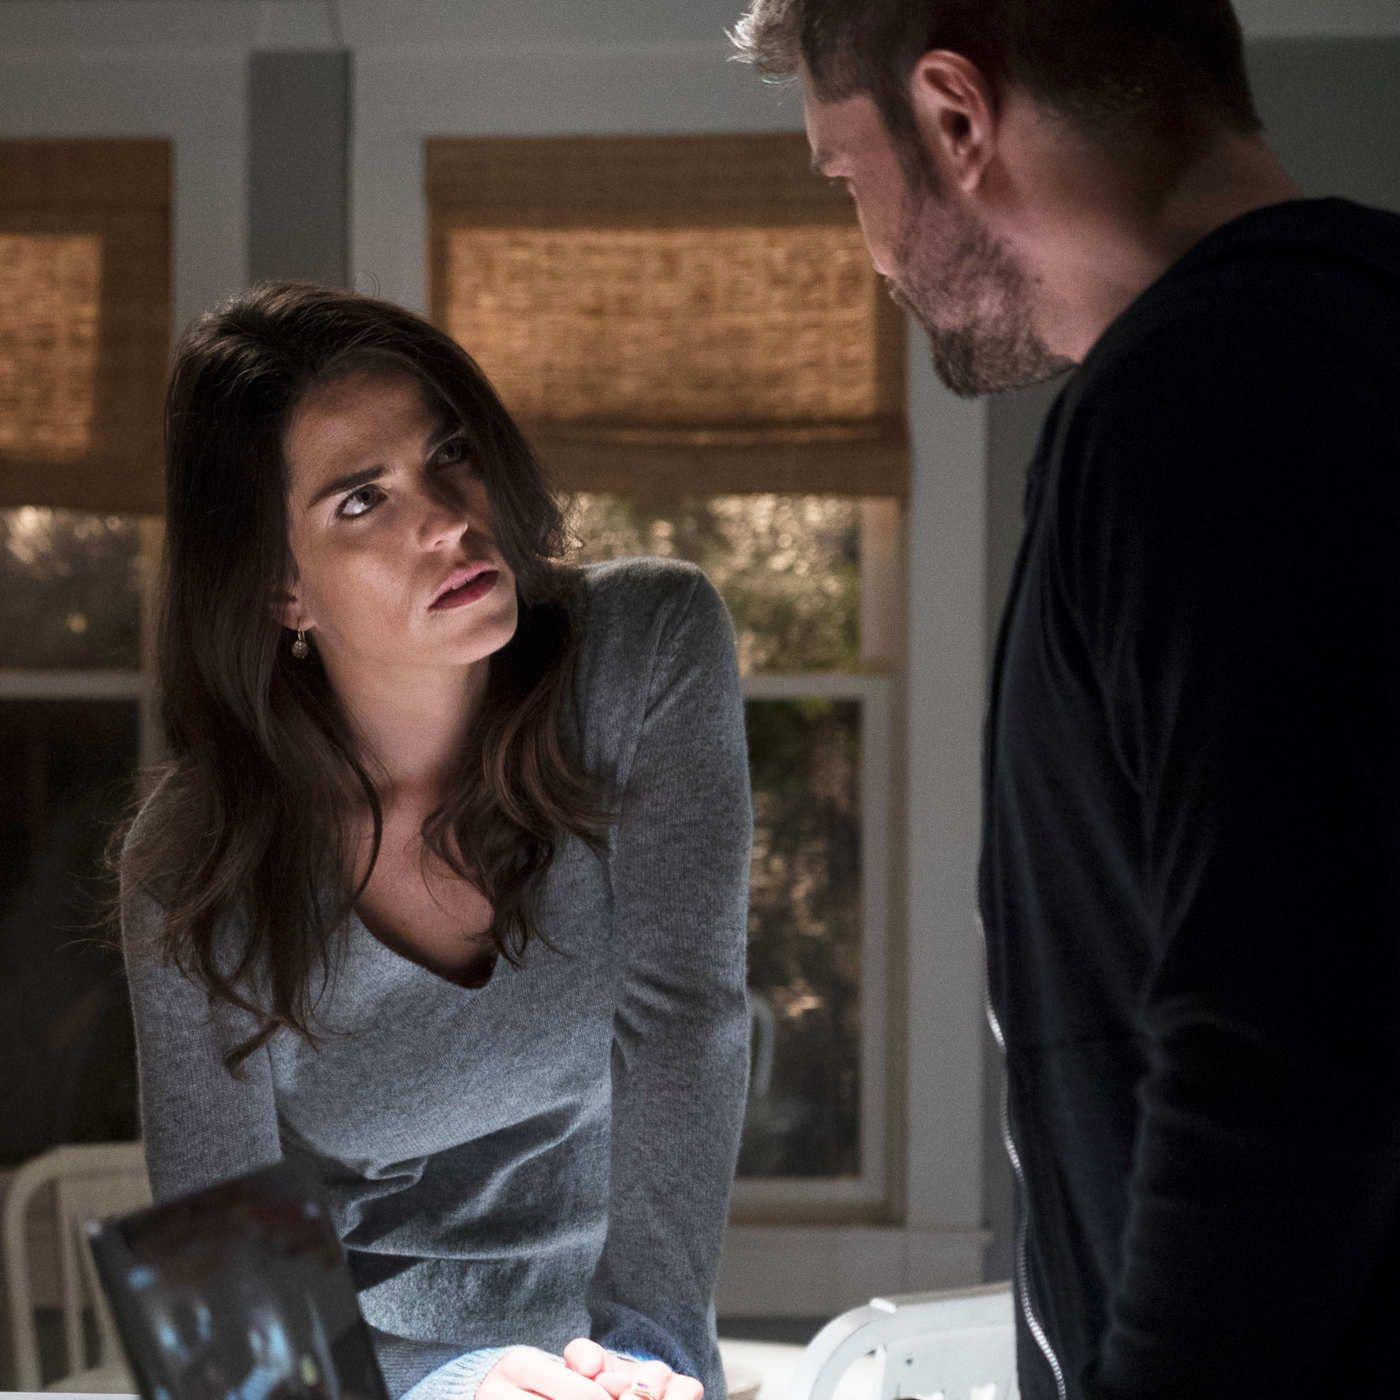 1f32a82fed9420e9547a5f5866a410a7 - How To Get Away With Murder Episode Recap Season 4